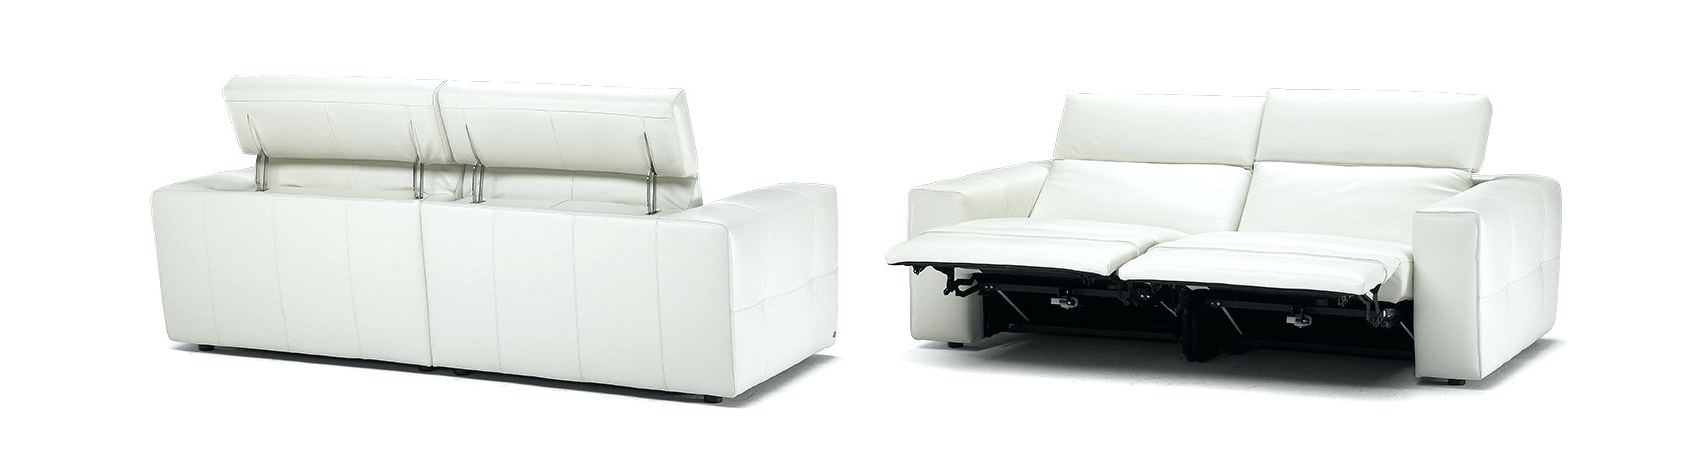 Natuzzi Zeta Chaise Lounge Chairs • Lounge Chairs Ideas With Regard To Fashionable Natuzzi Zeta Chaise Lounge Chairs (View 10 of 15)